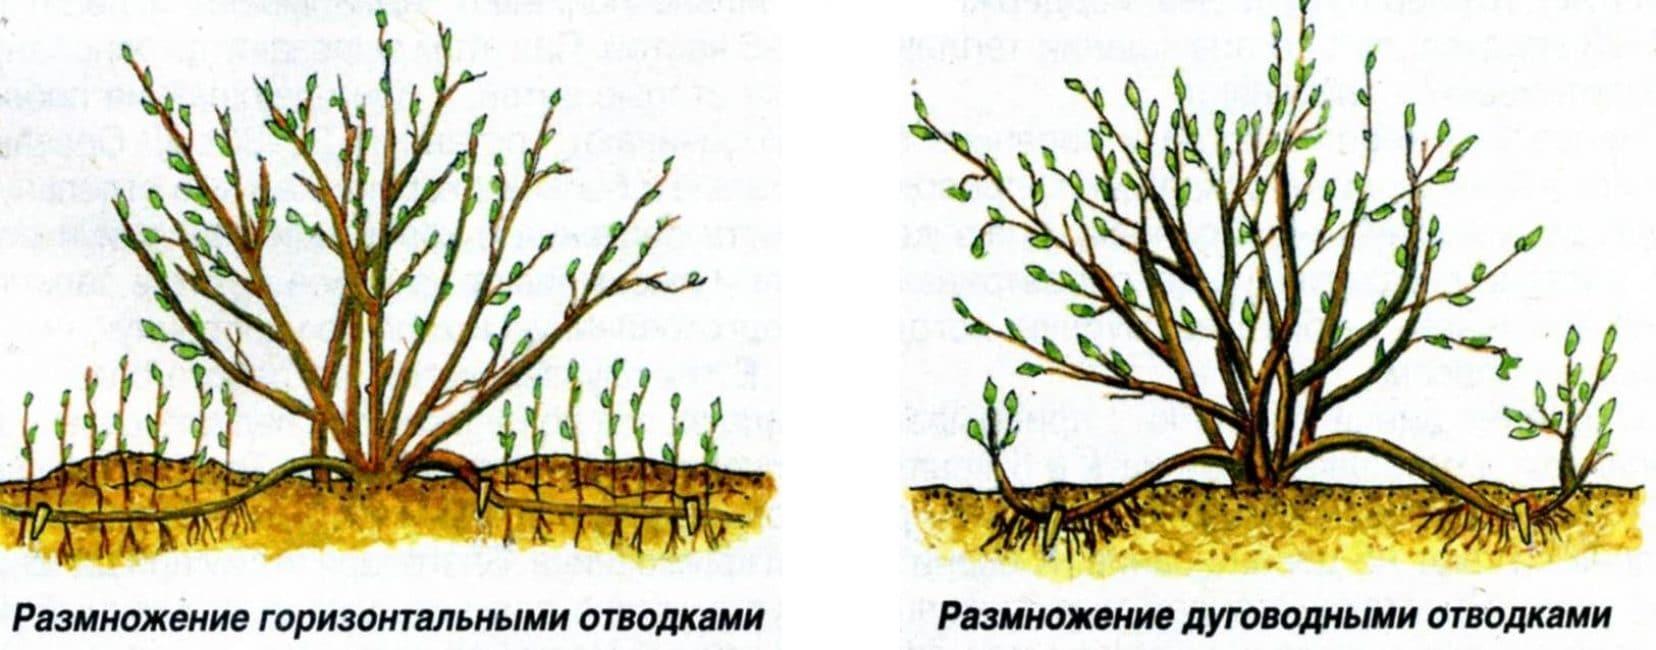 Схема размножения отводками